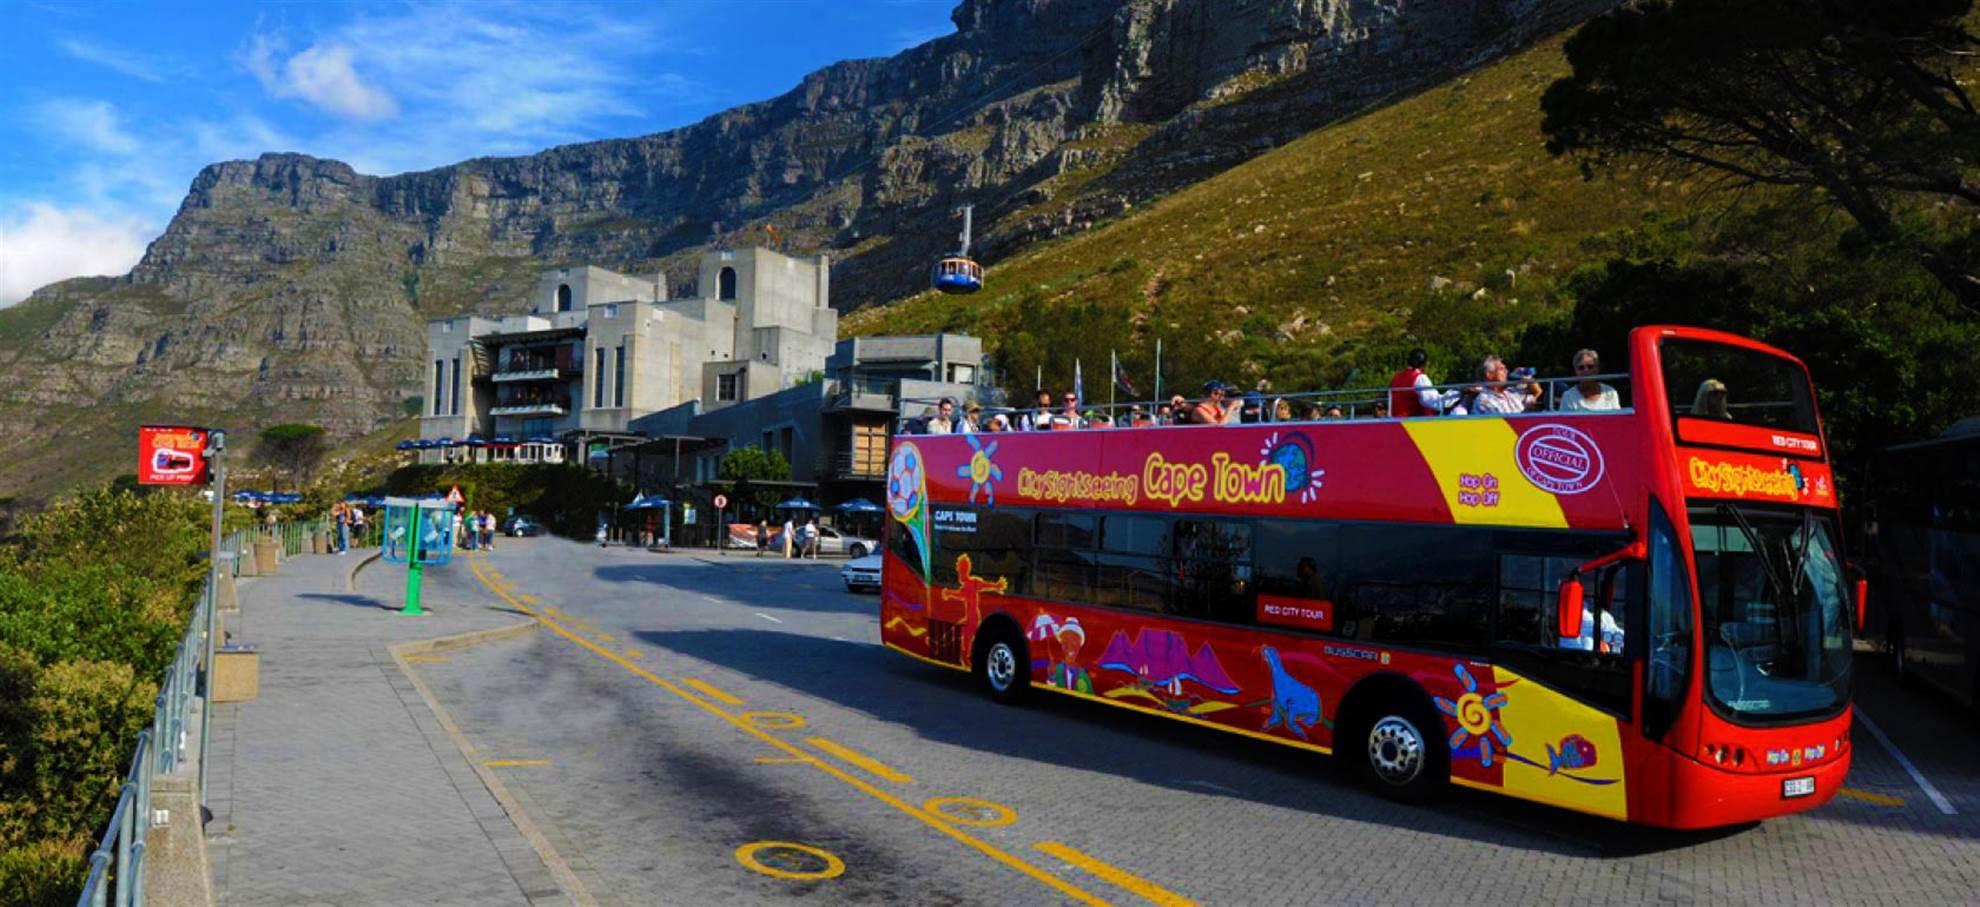 Kaapstad Hop on Hop off Bus